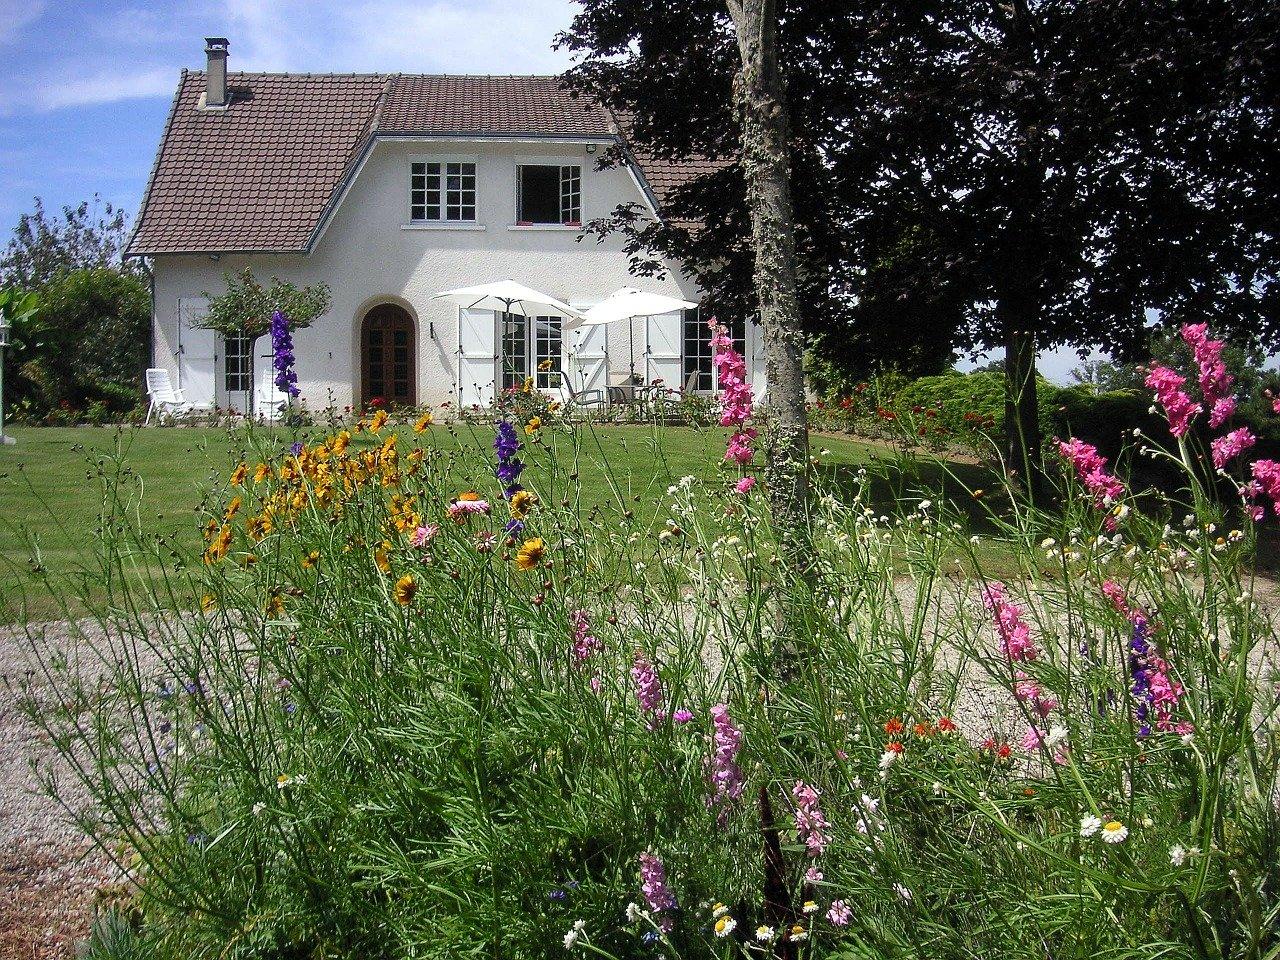 Bella casa con un bel giardino